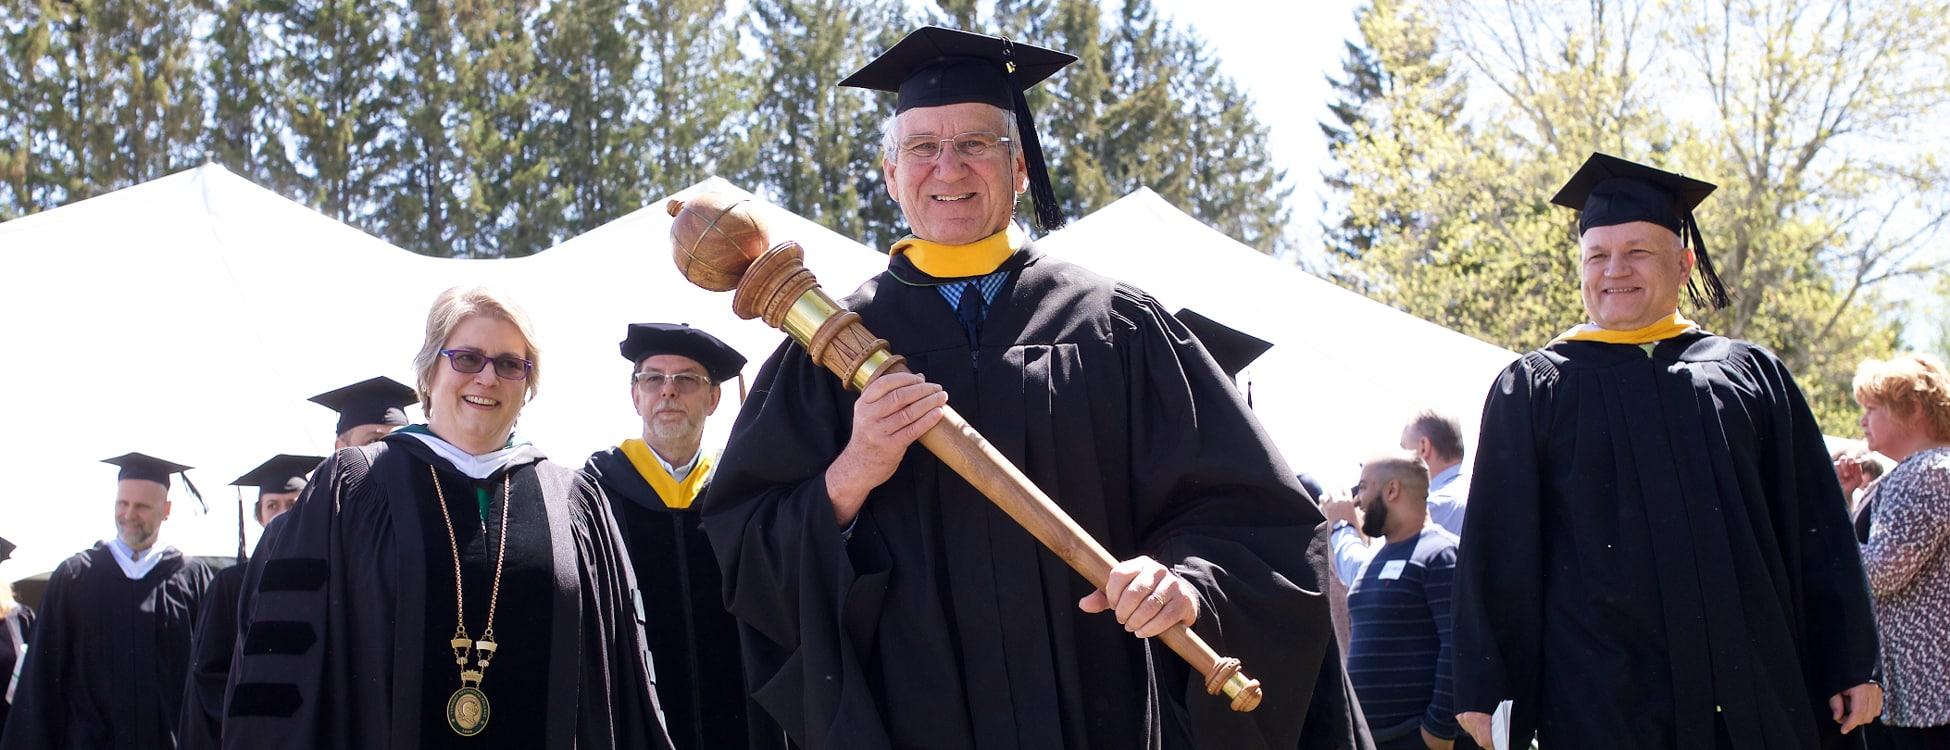 commencement, graduation, John Knox, sun, smiling